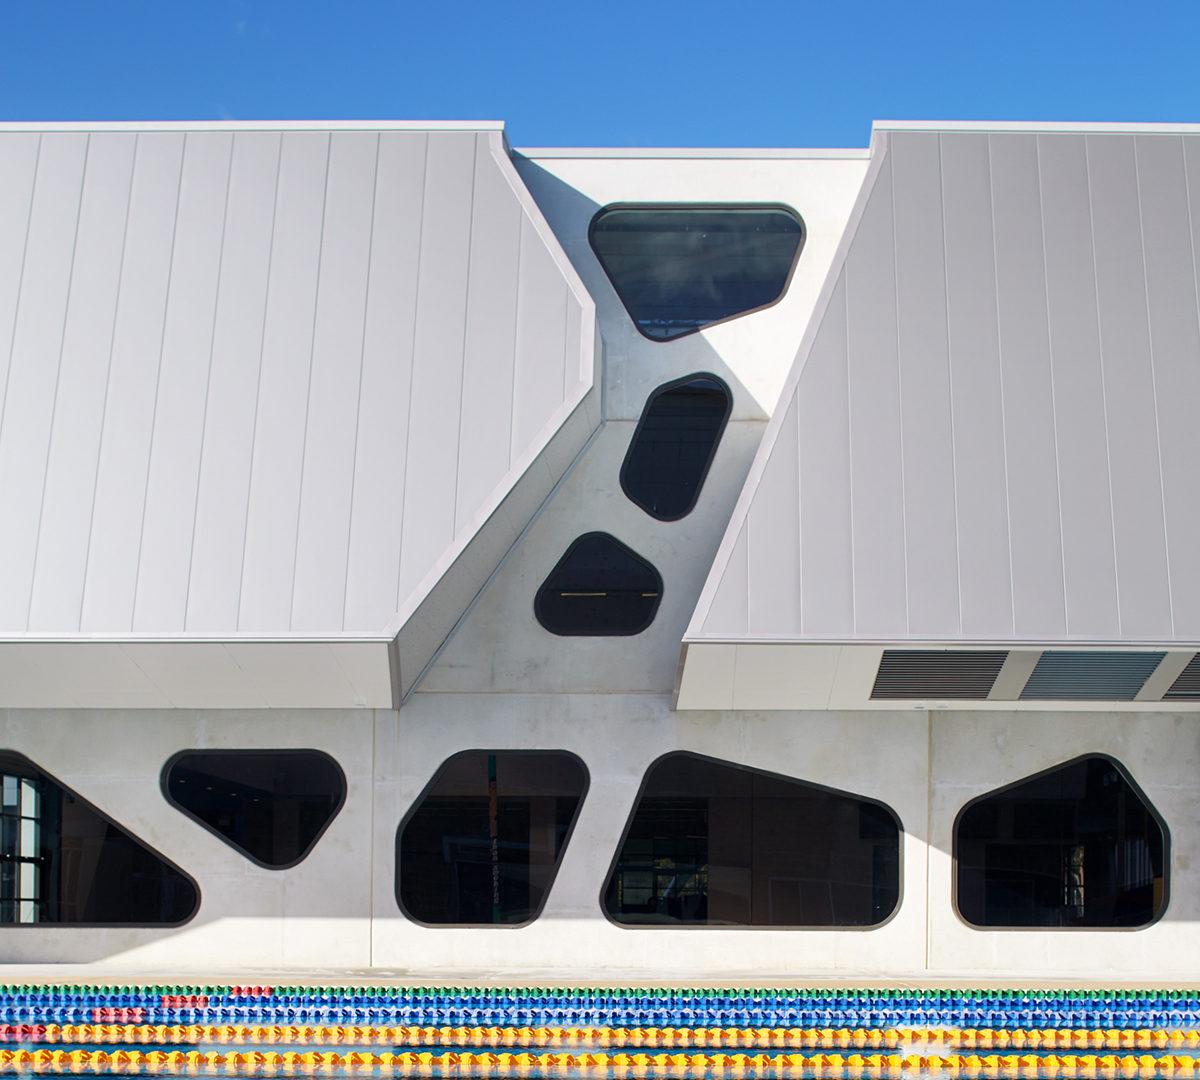 WAIS, Architect: dwp | suters and Sandover Pinder